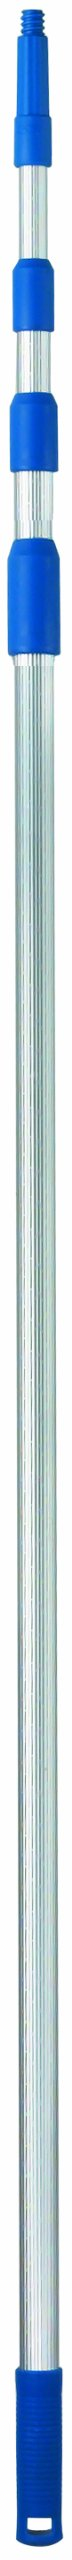 Ettore 44016 REA-C-H Extension Pole, 16-Feet